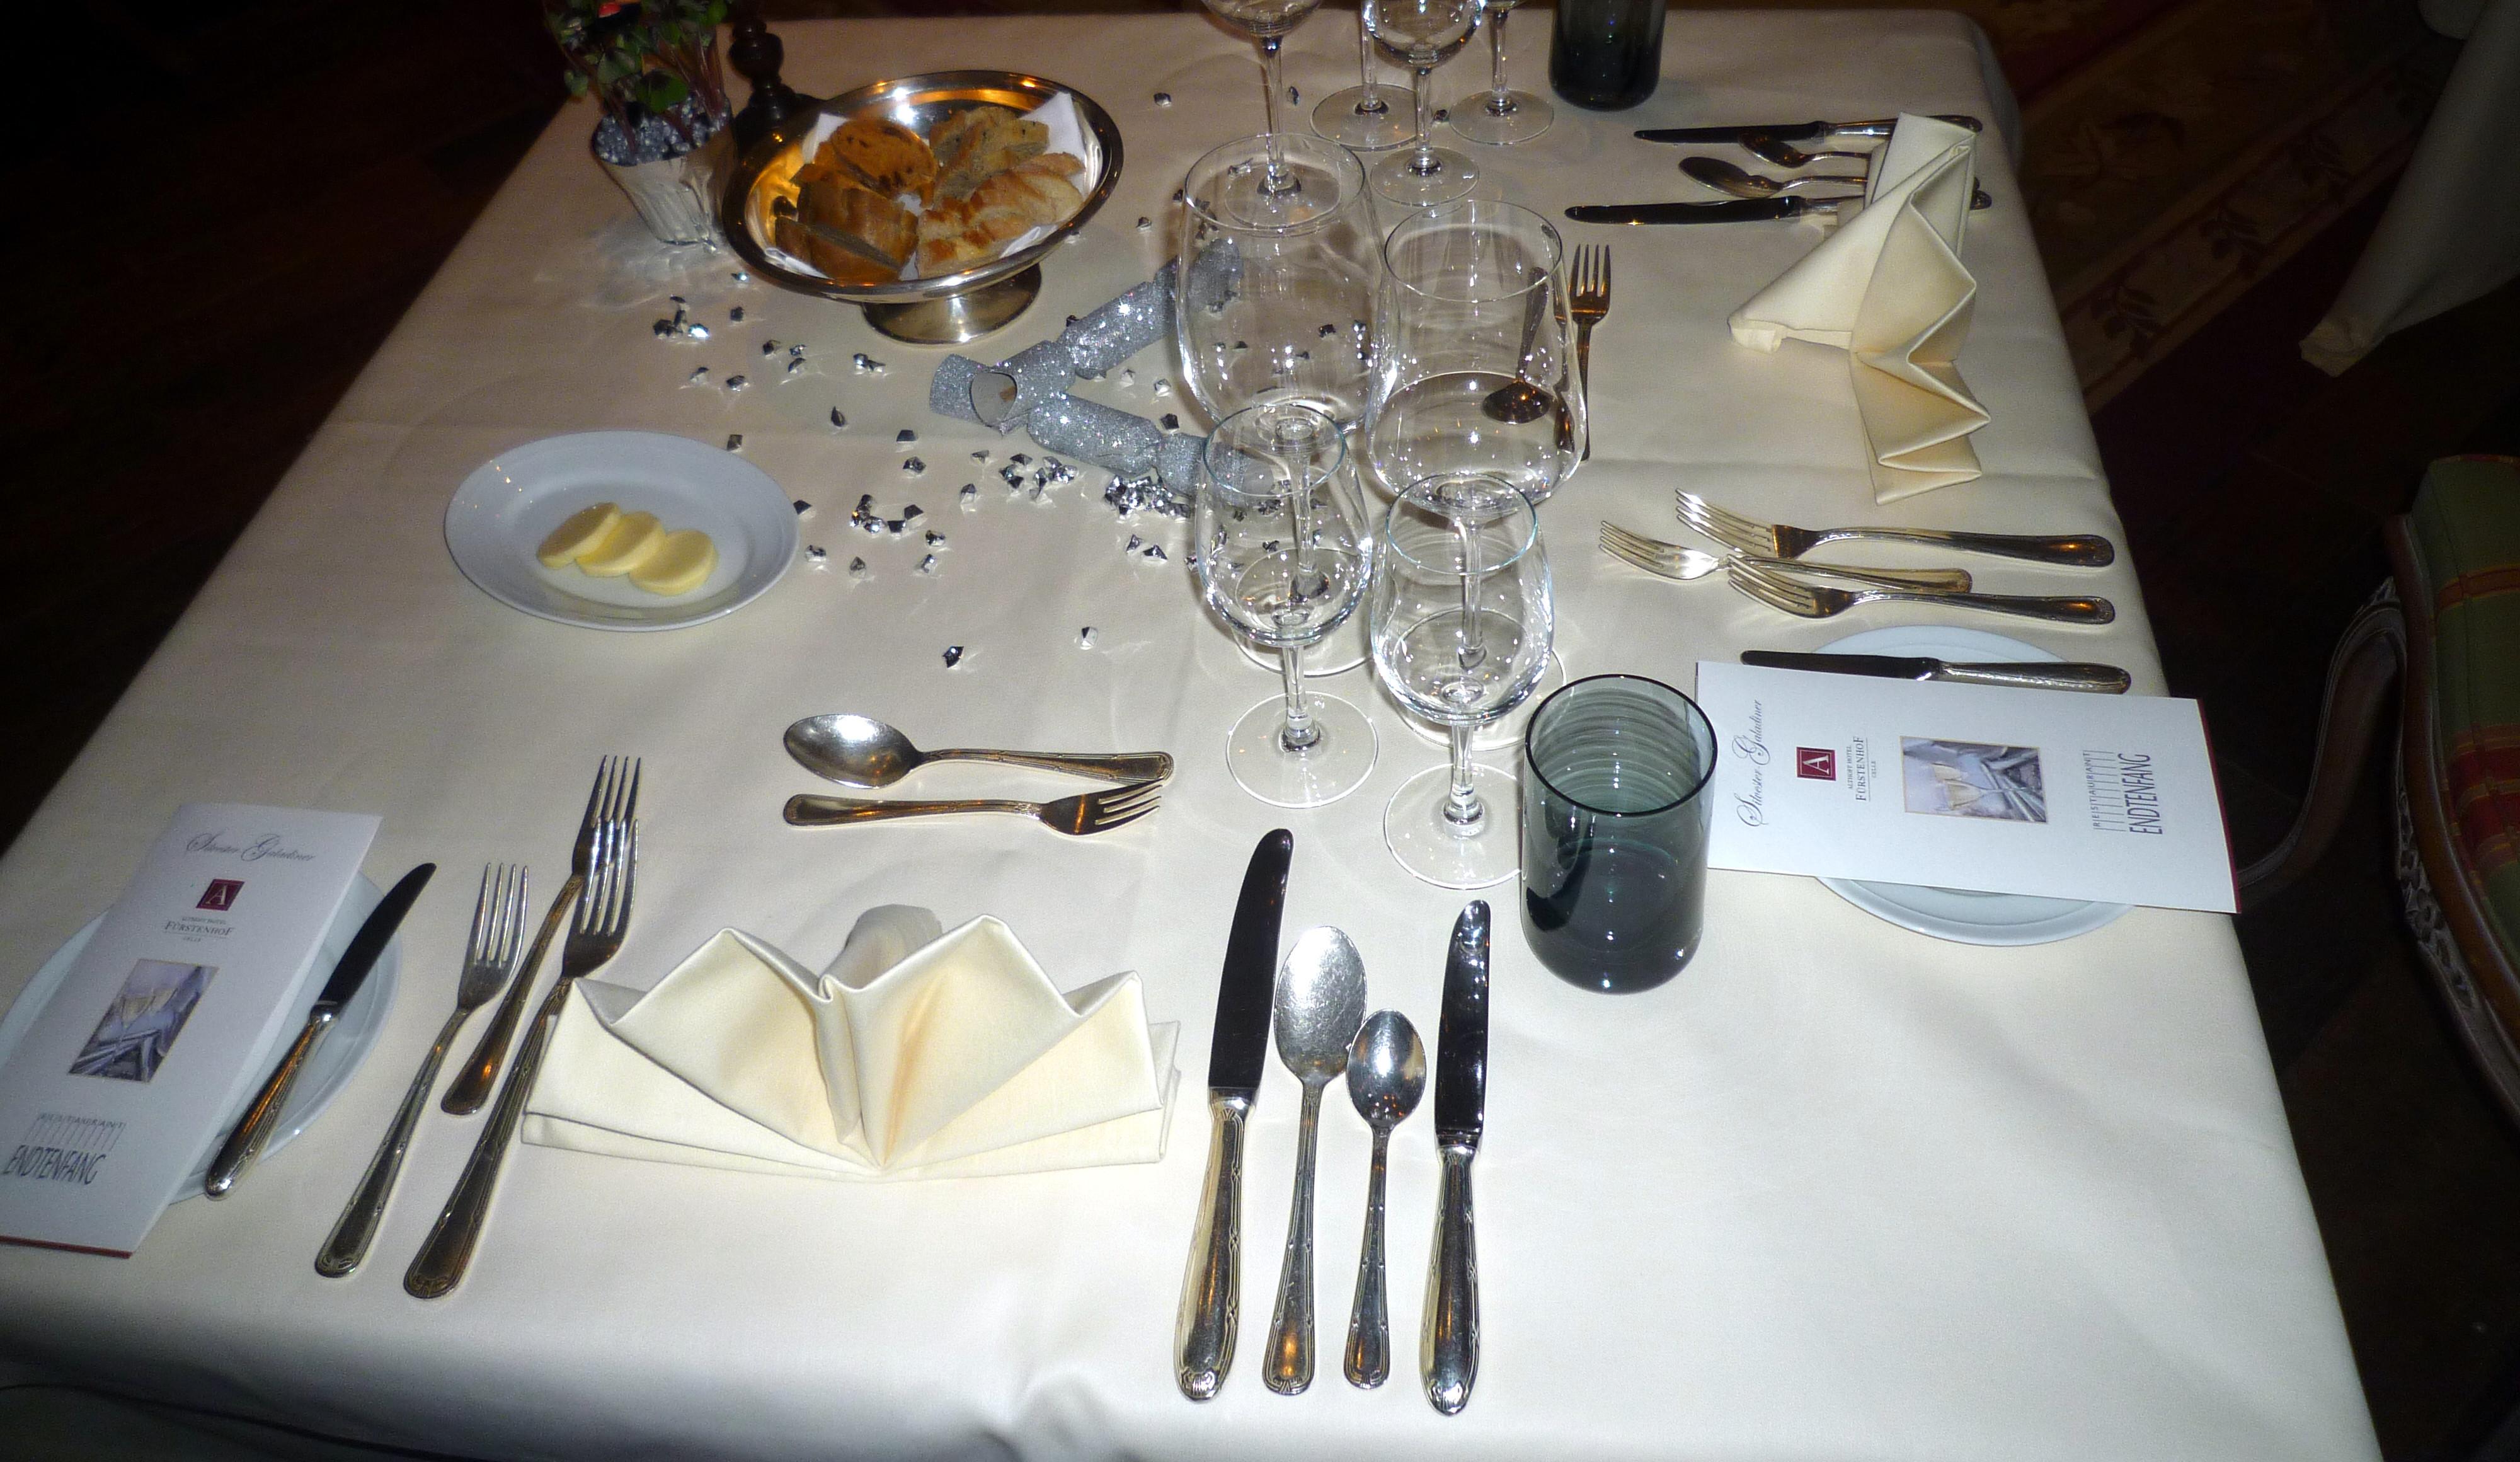 02 Endtenfang Tisch